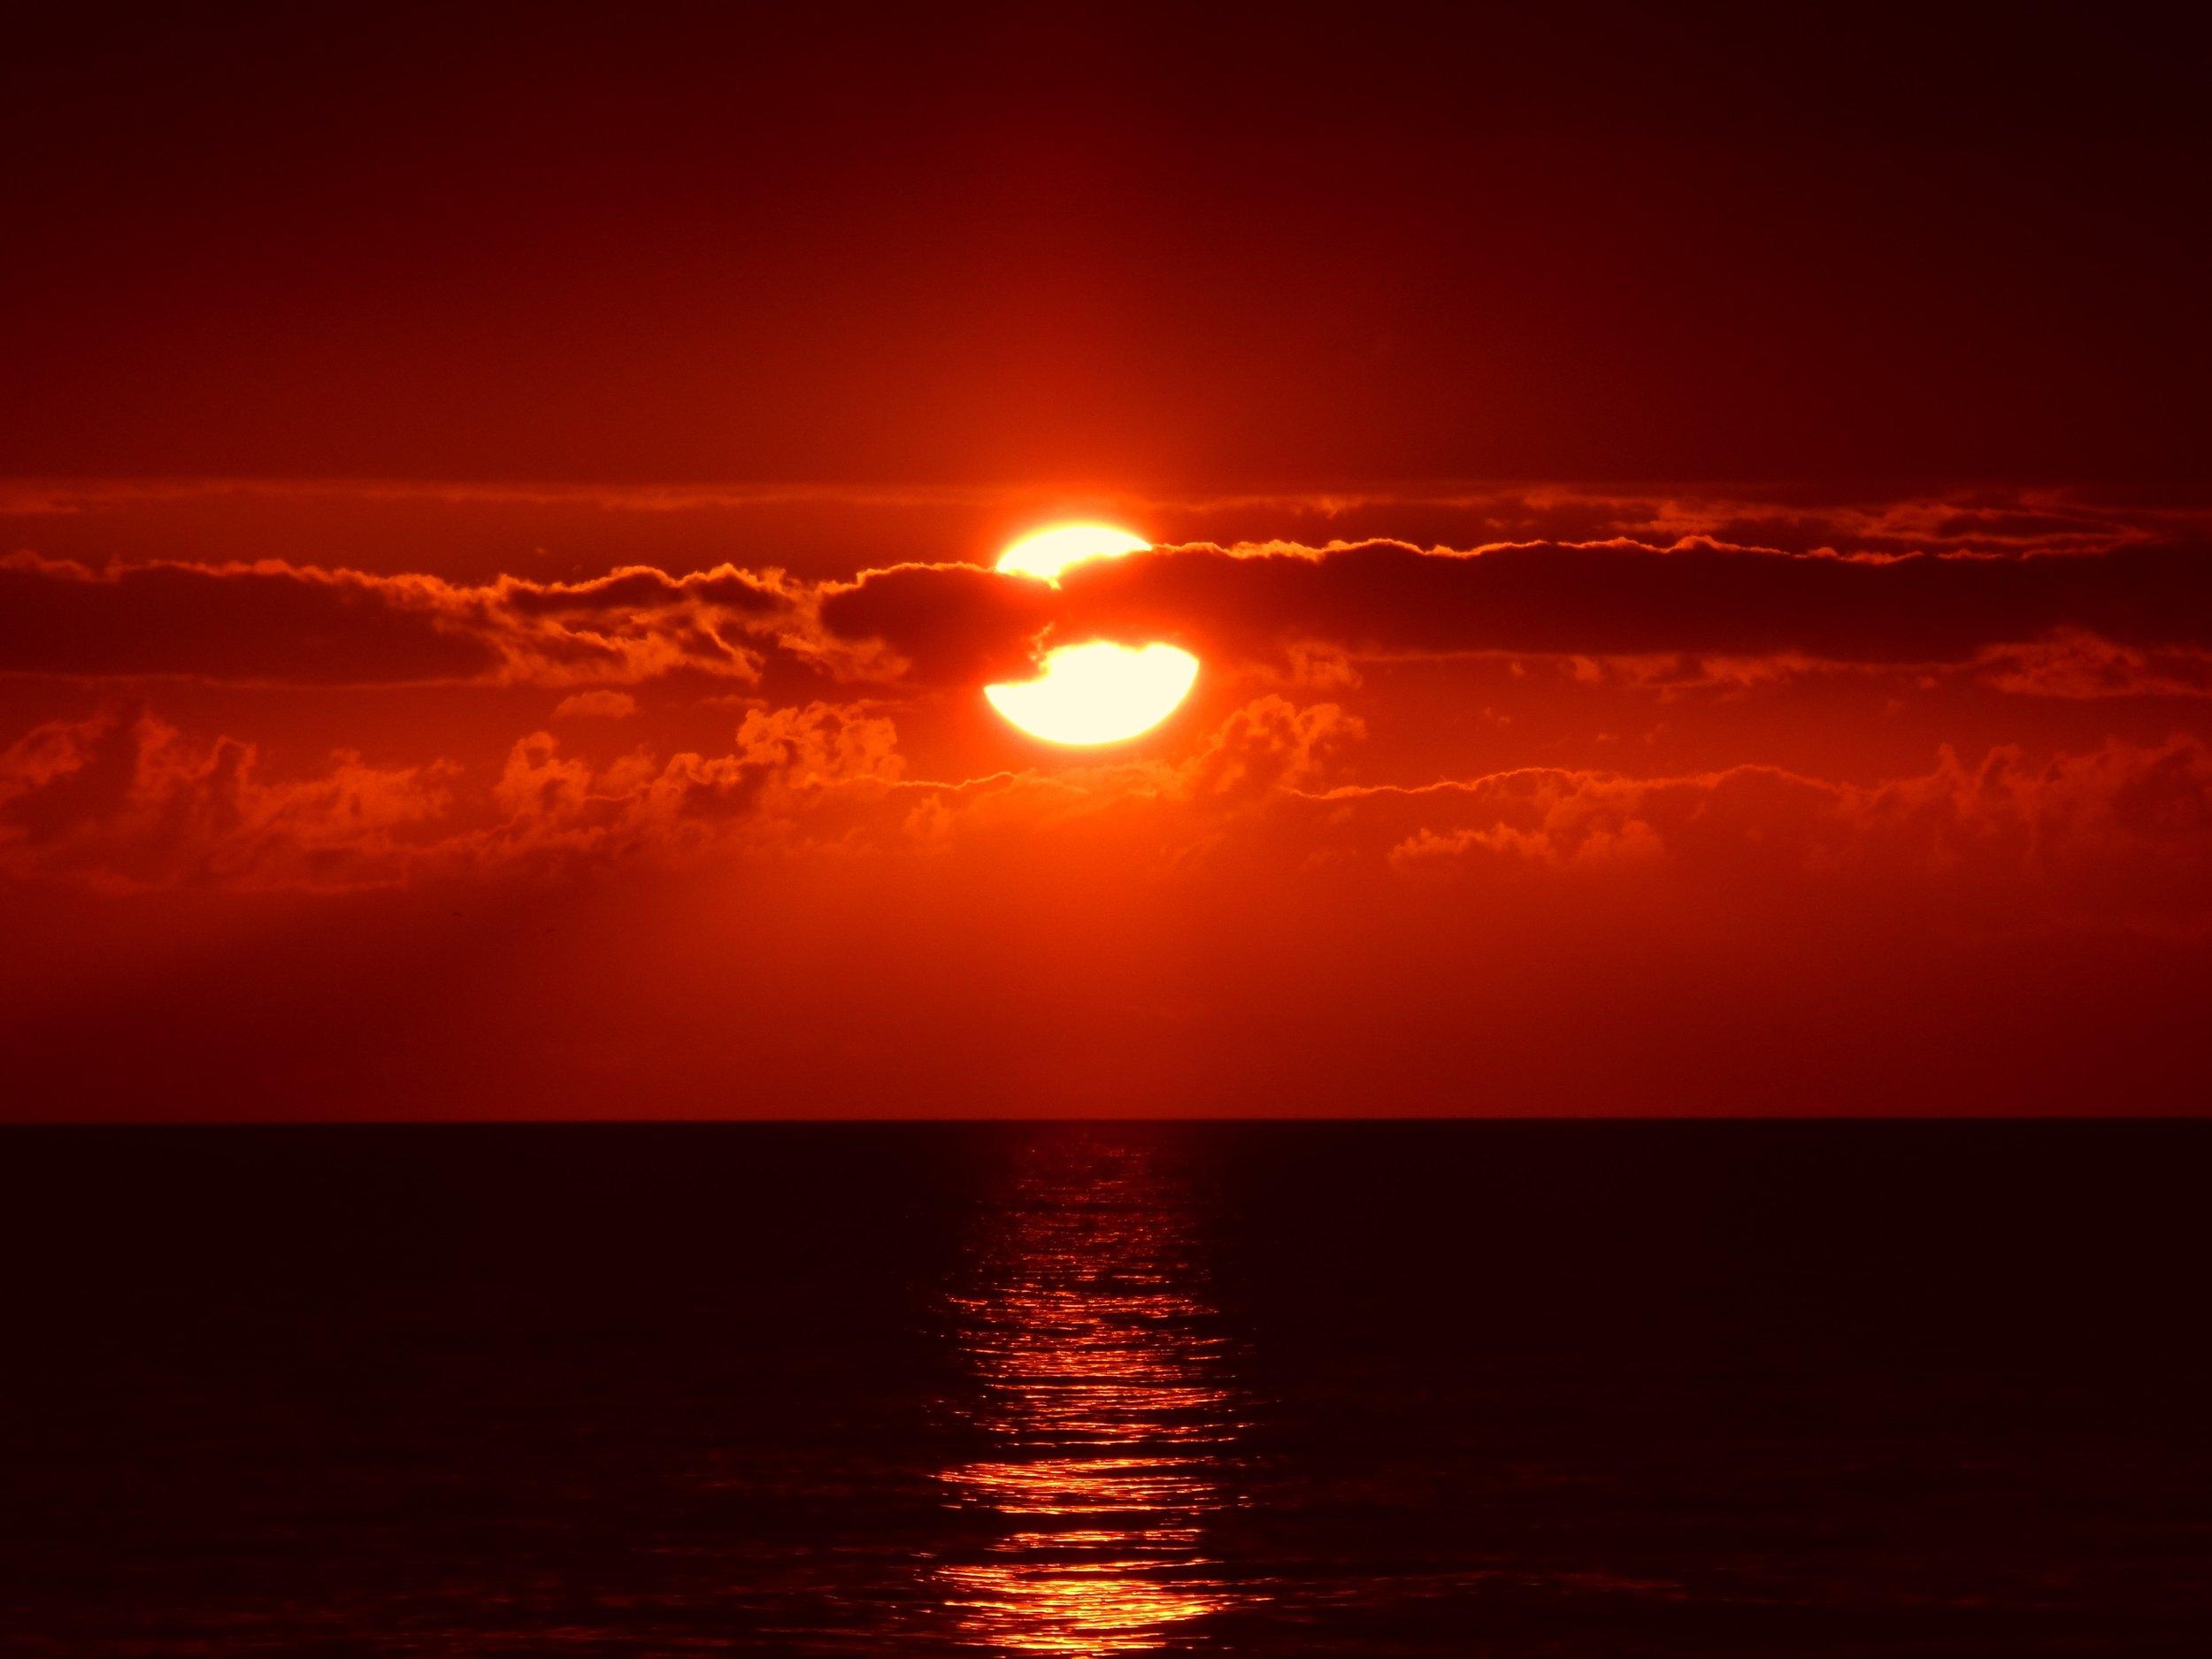 sunset-205717.jpg